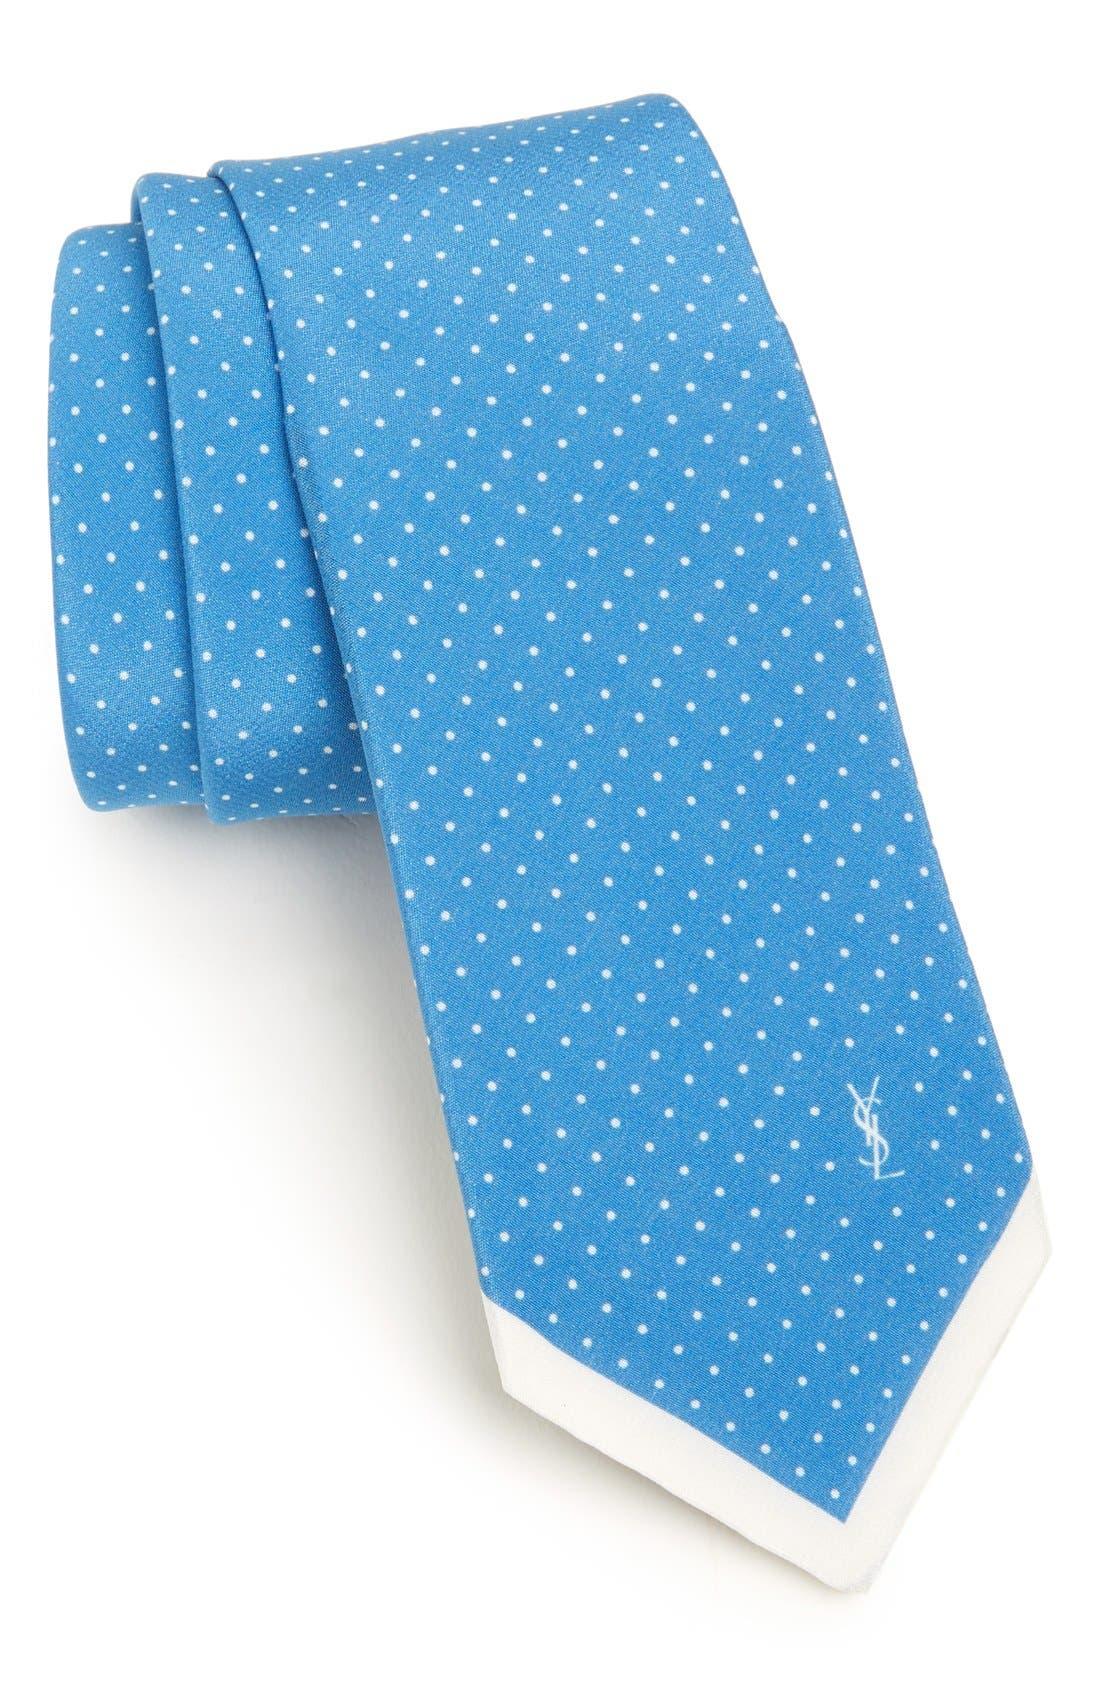 Alternate Image 1 Selected - Yves Saint Laurent Woven Silk Tie